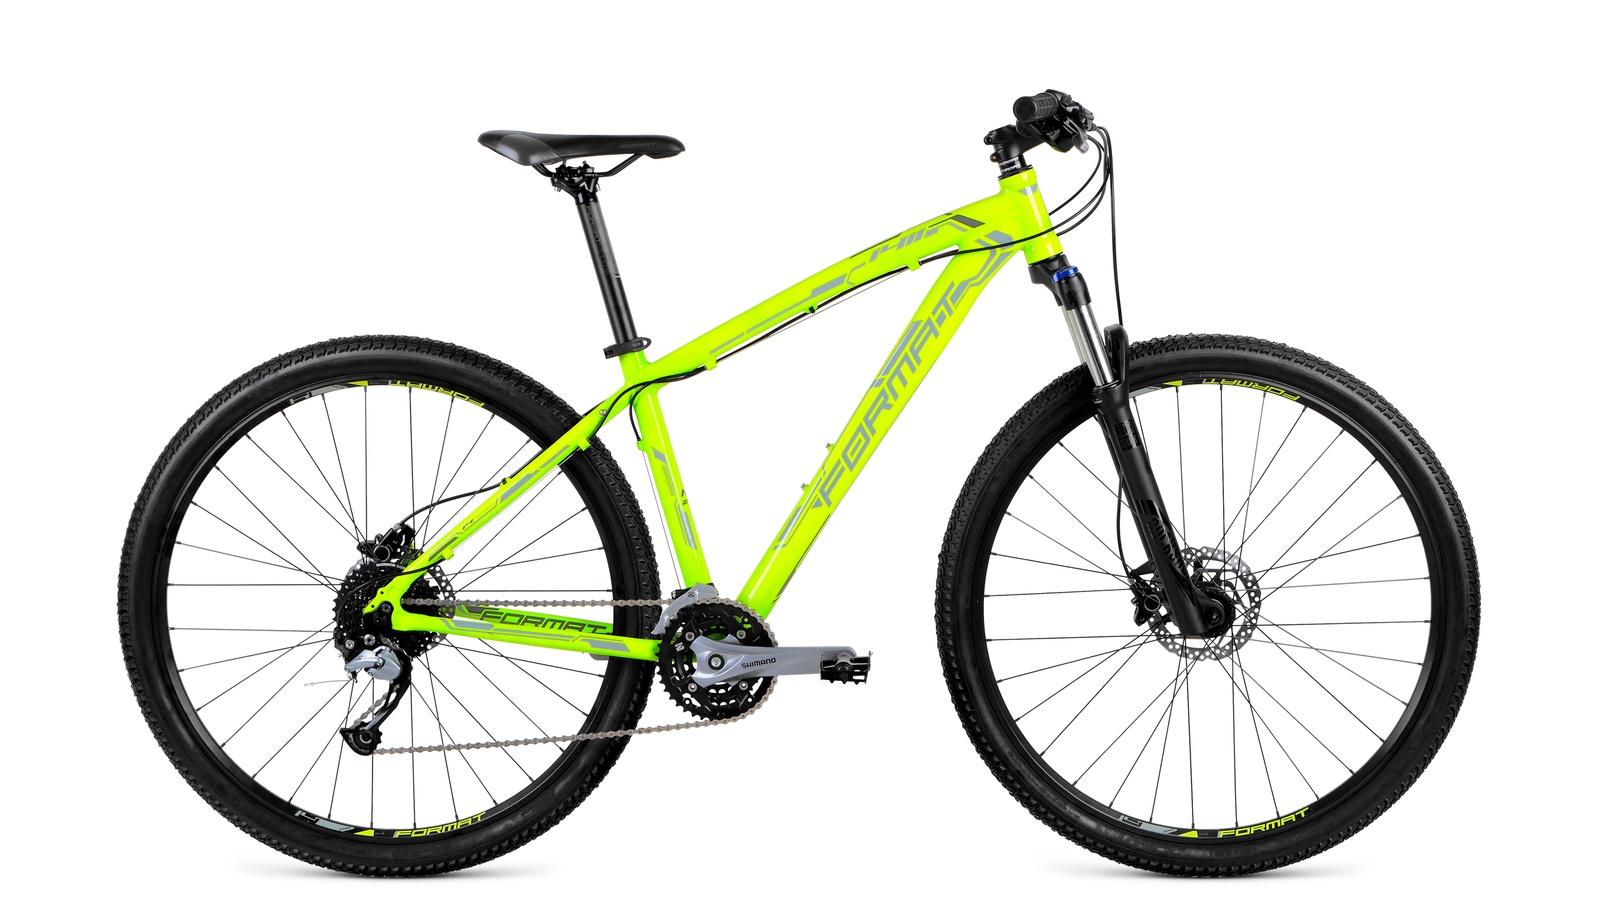 Велосипед Format RBKM9M69S007, желтый велосипед format 2211 2015